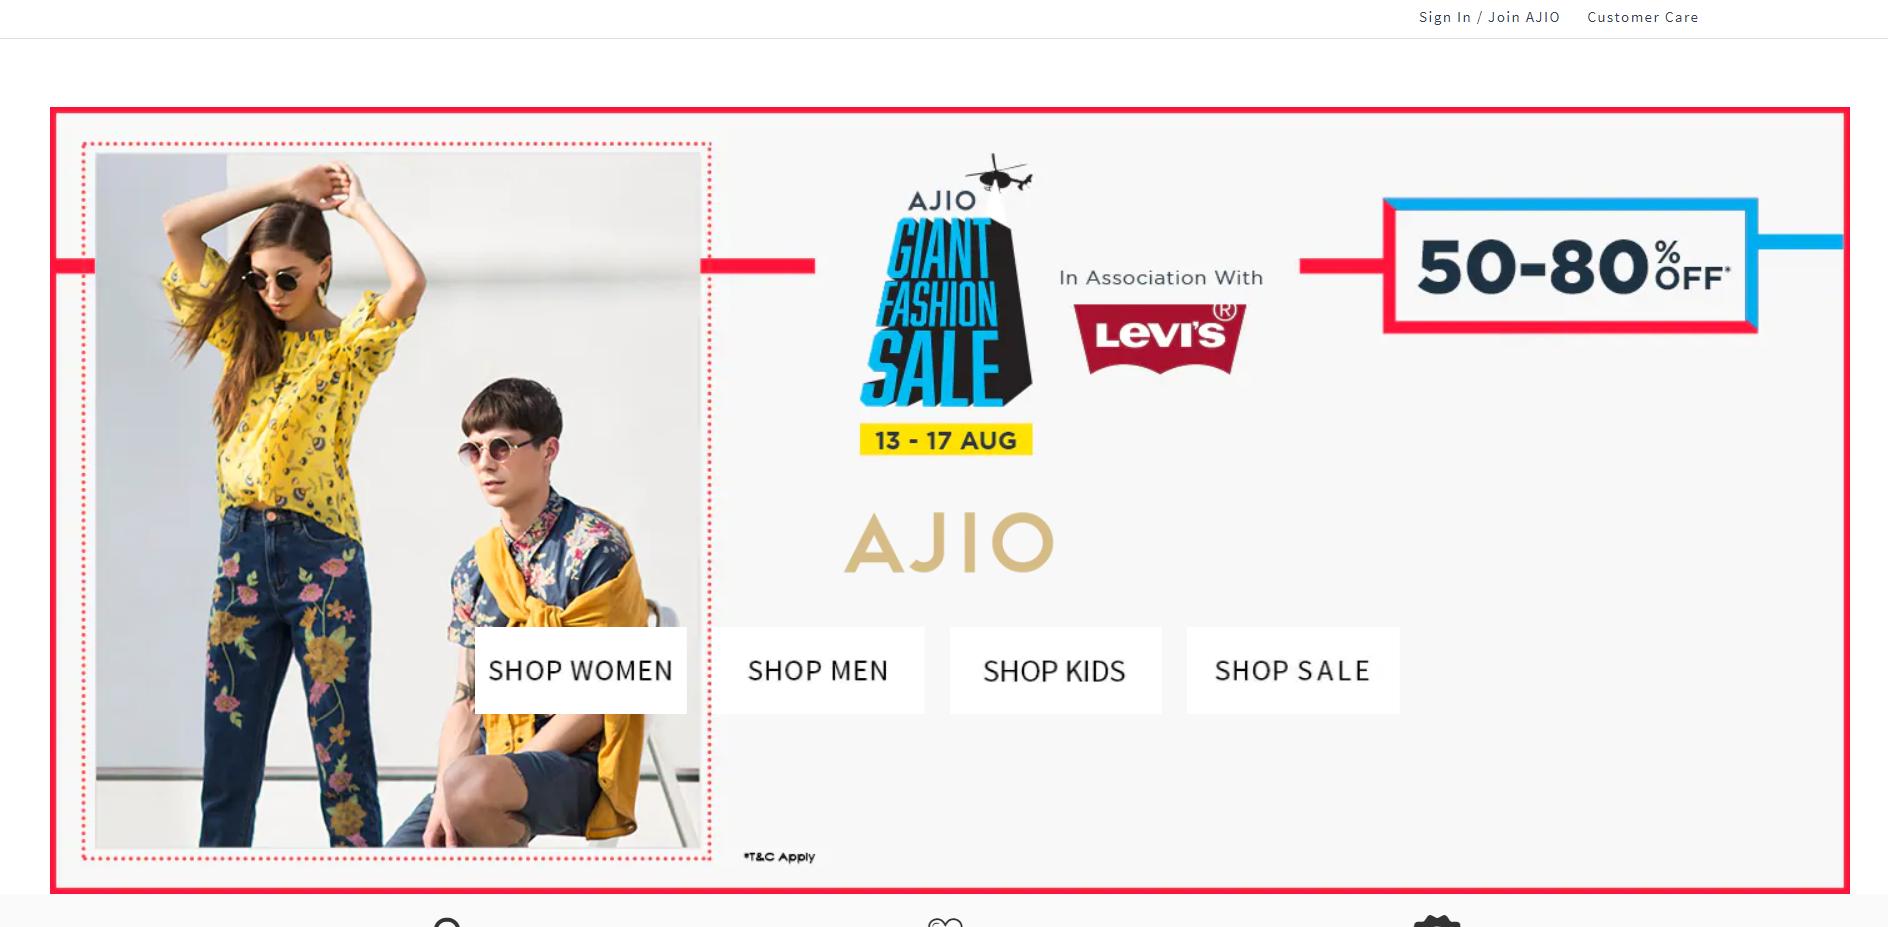 AJIO Store